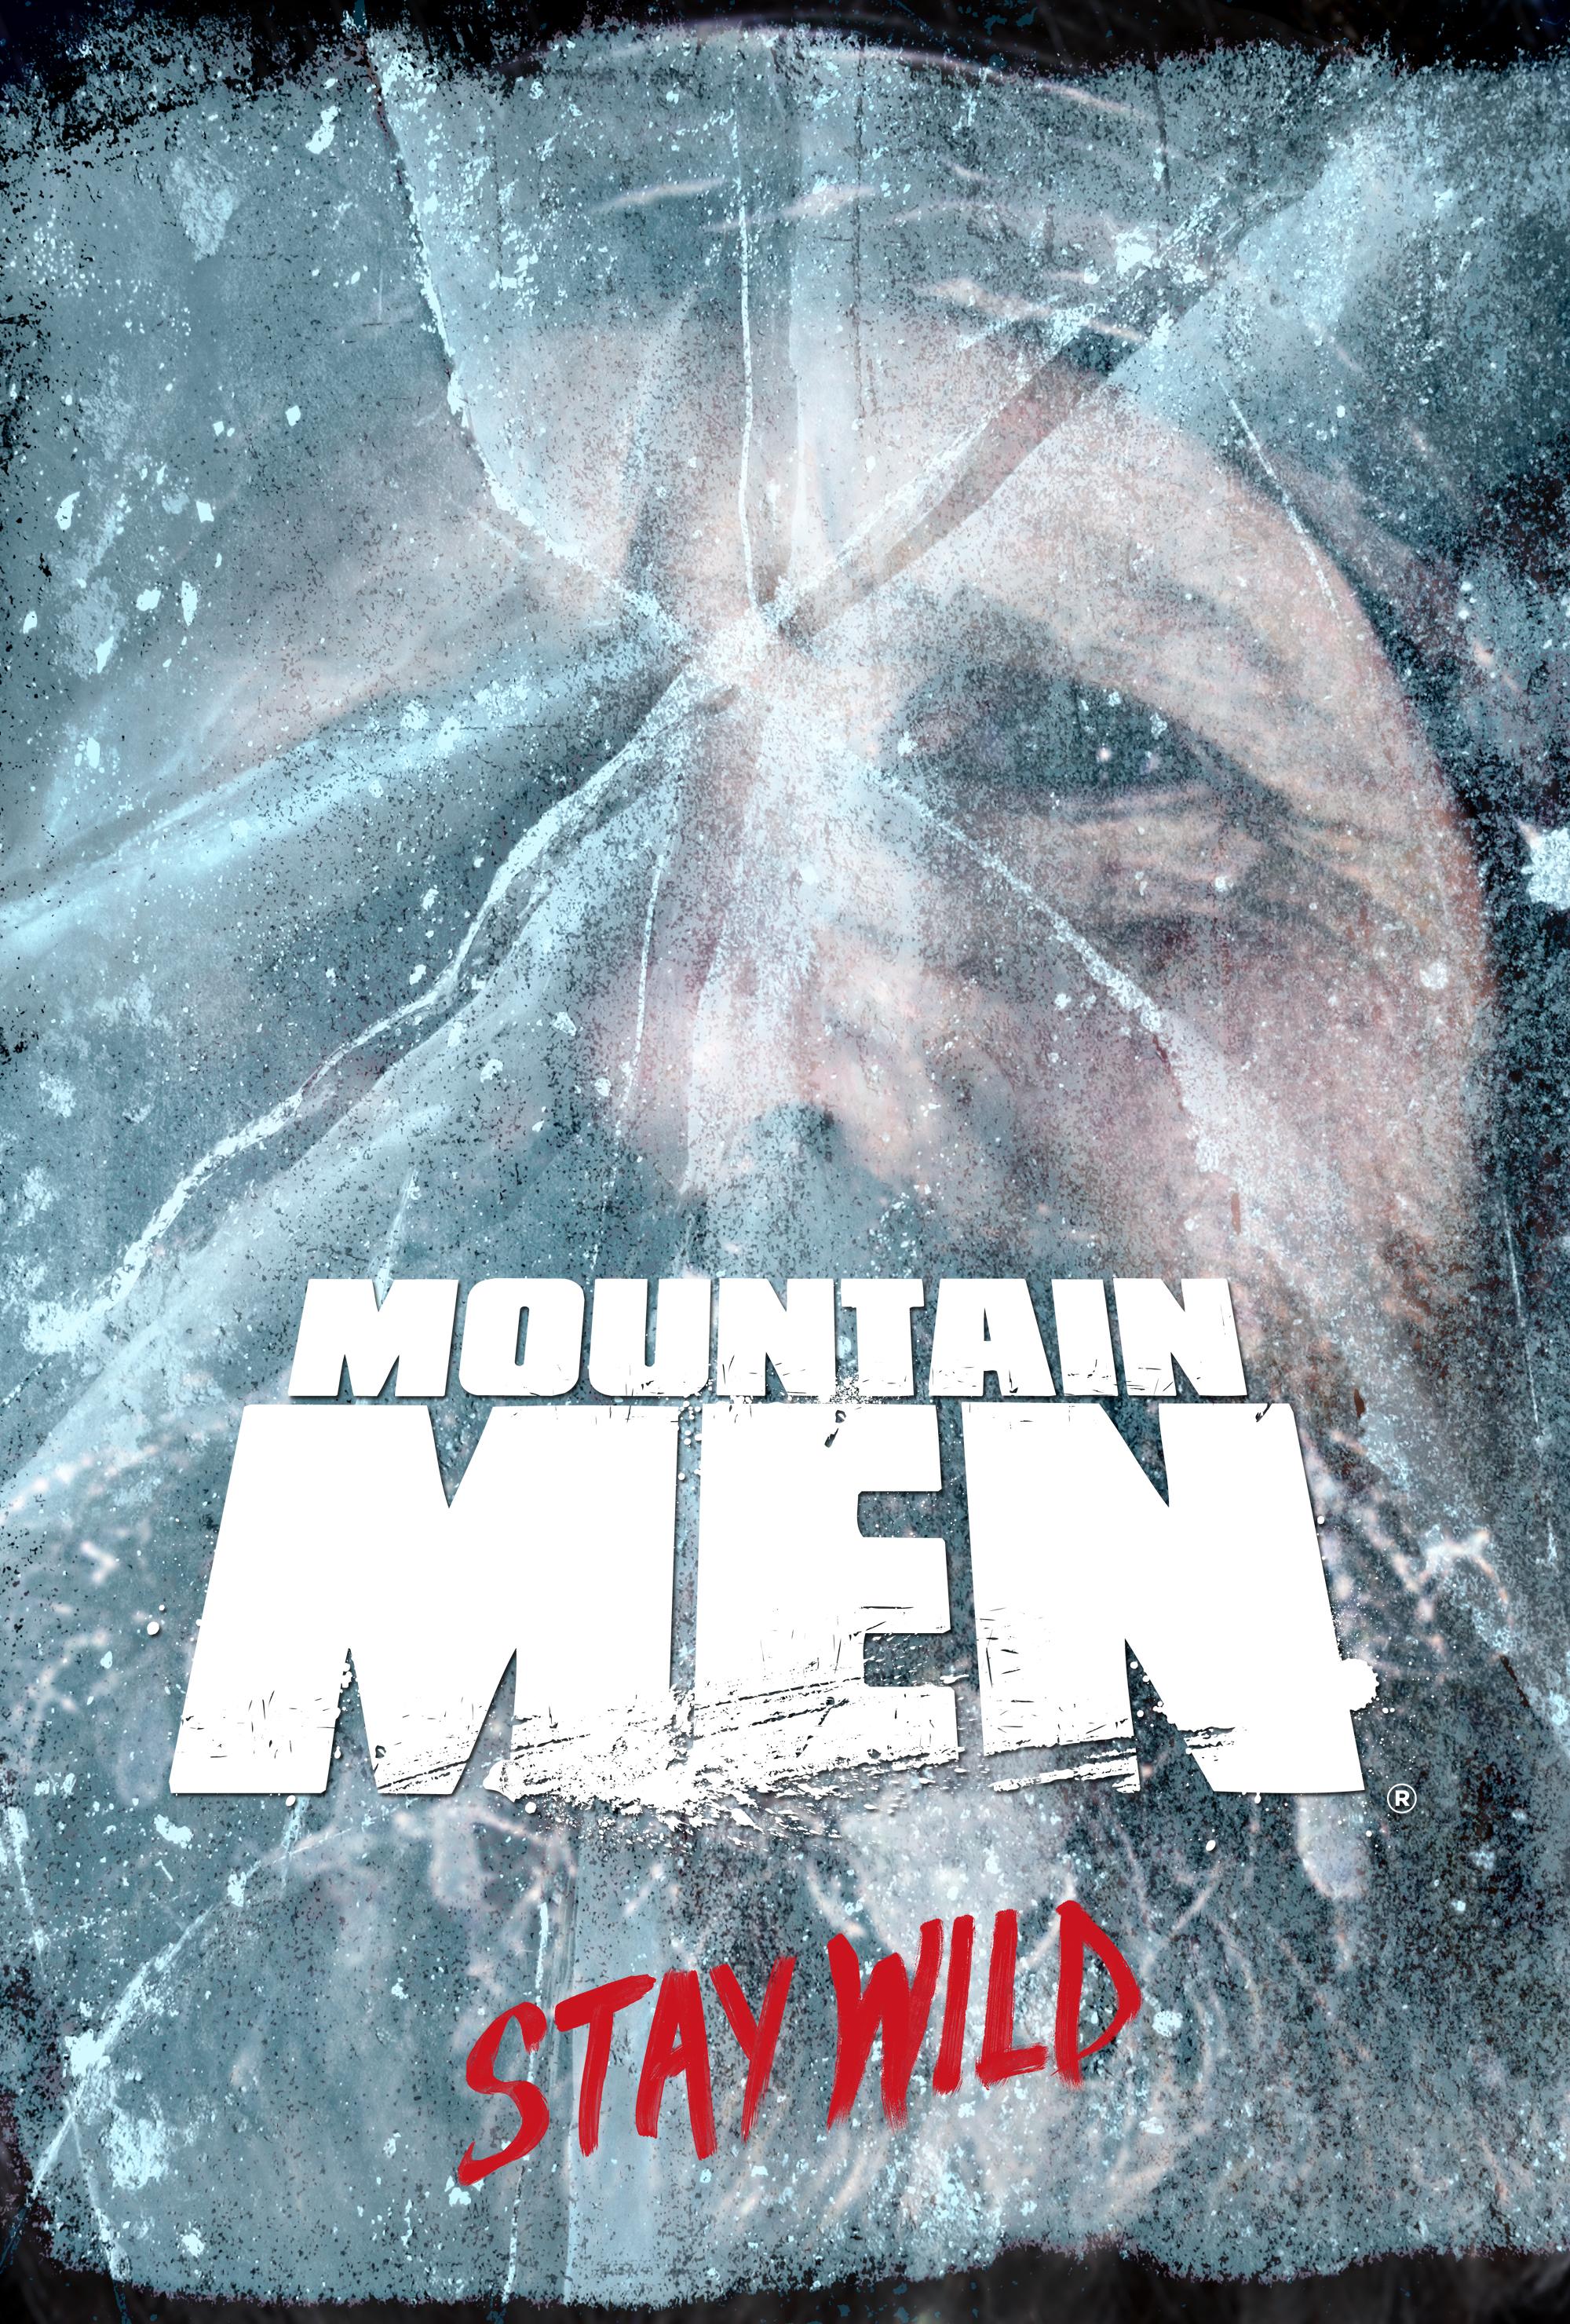 MountainMen.jpg